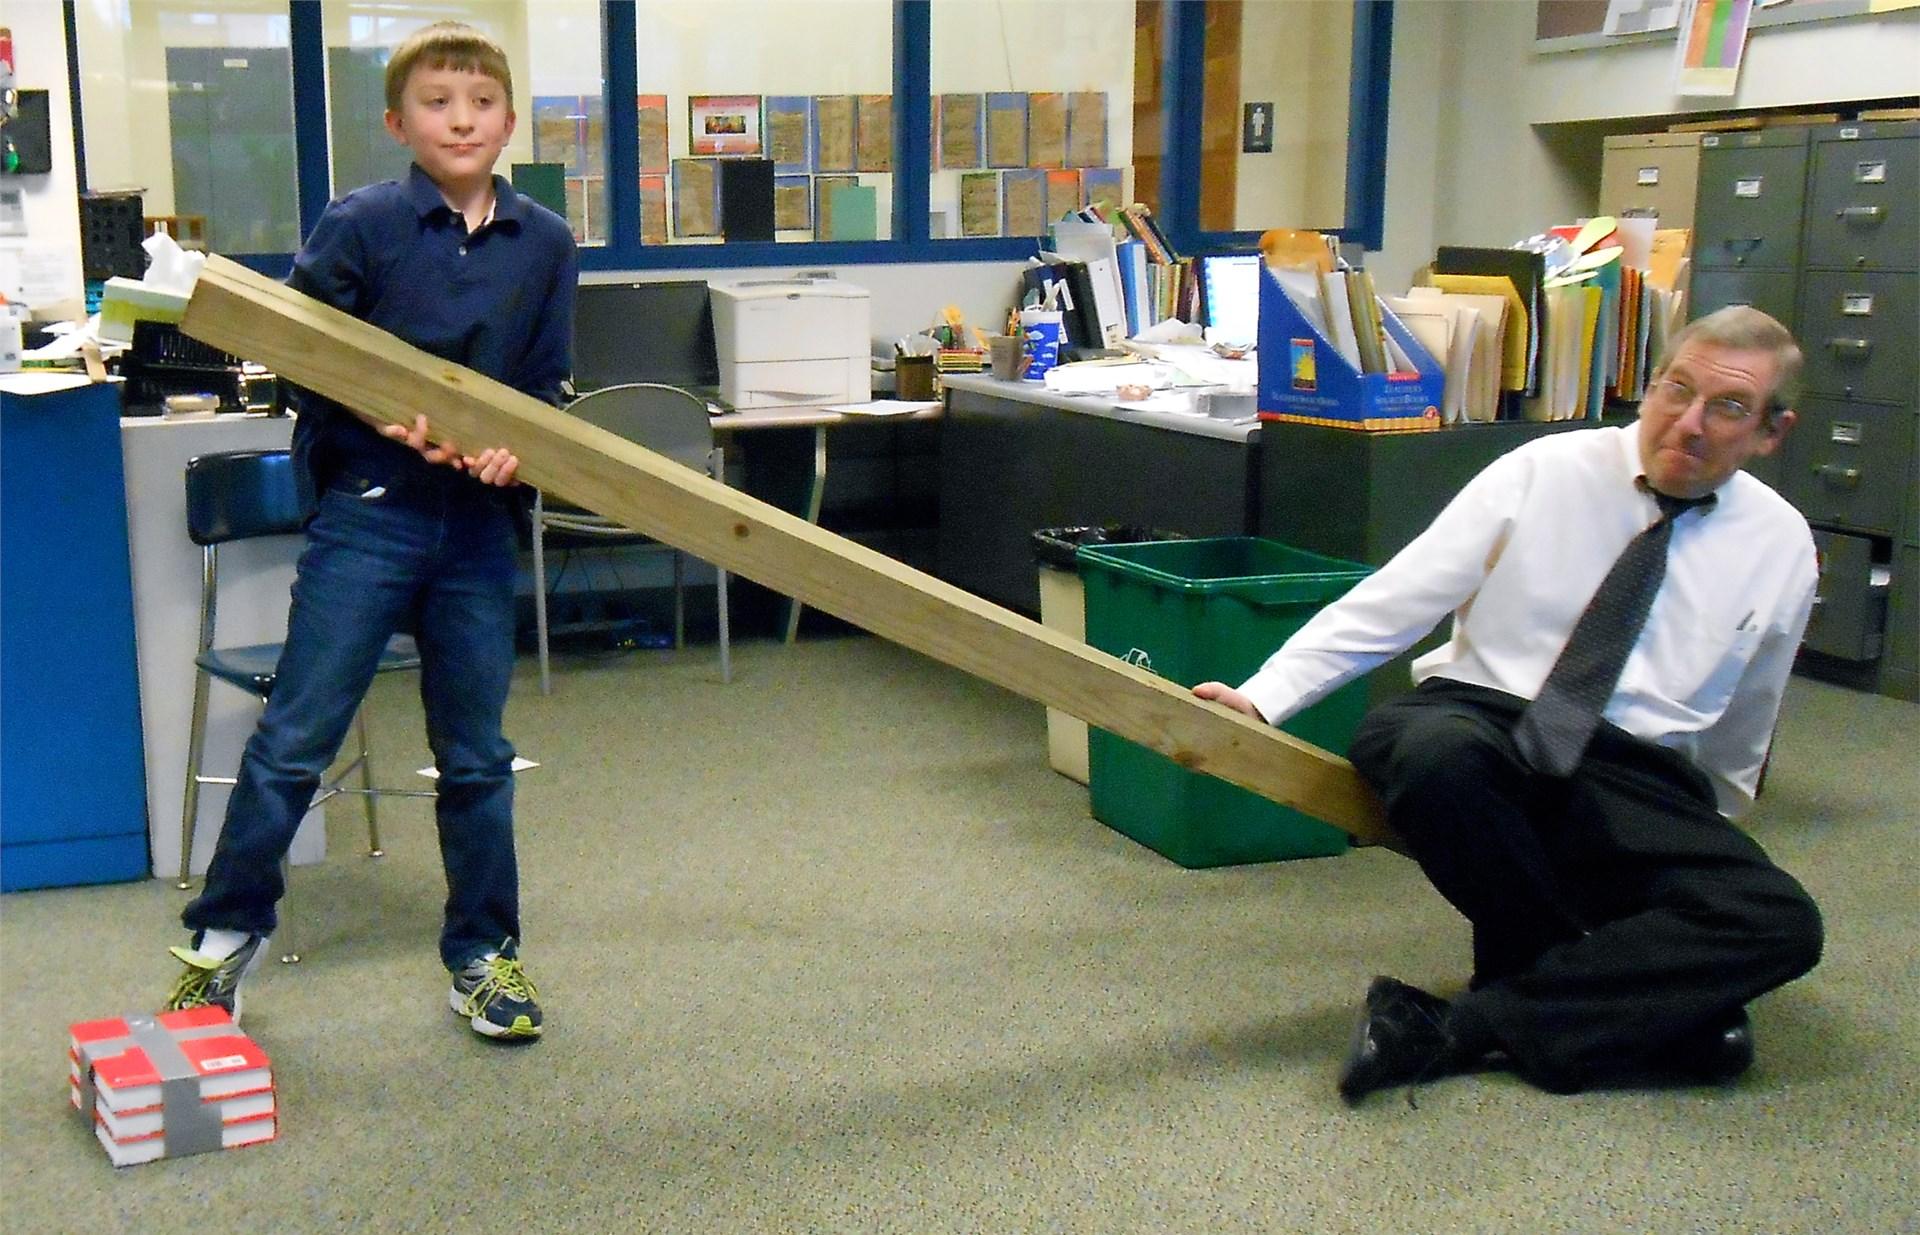 Lifting the teacher